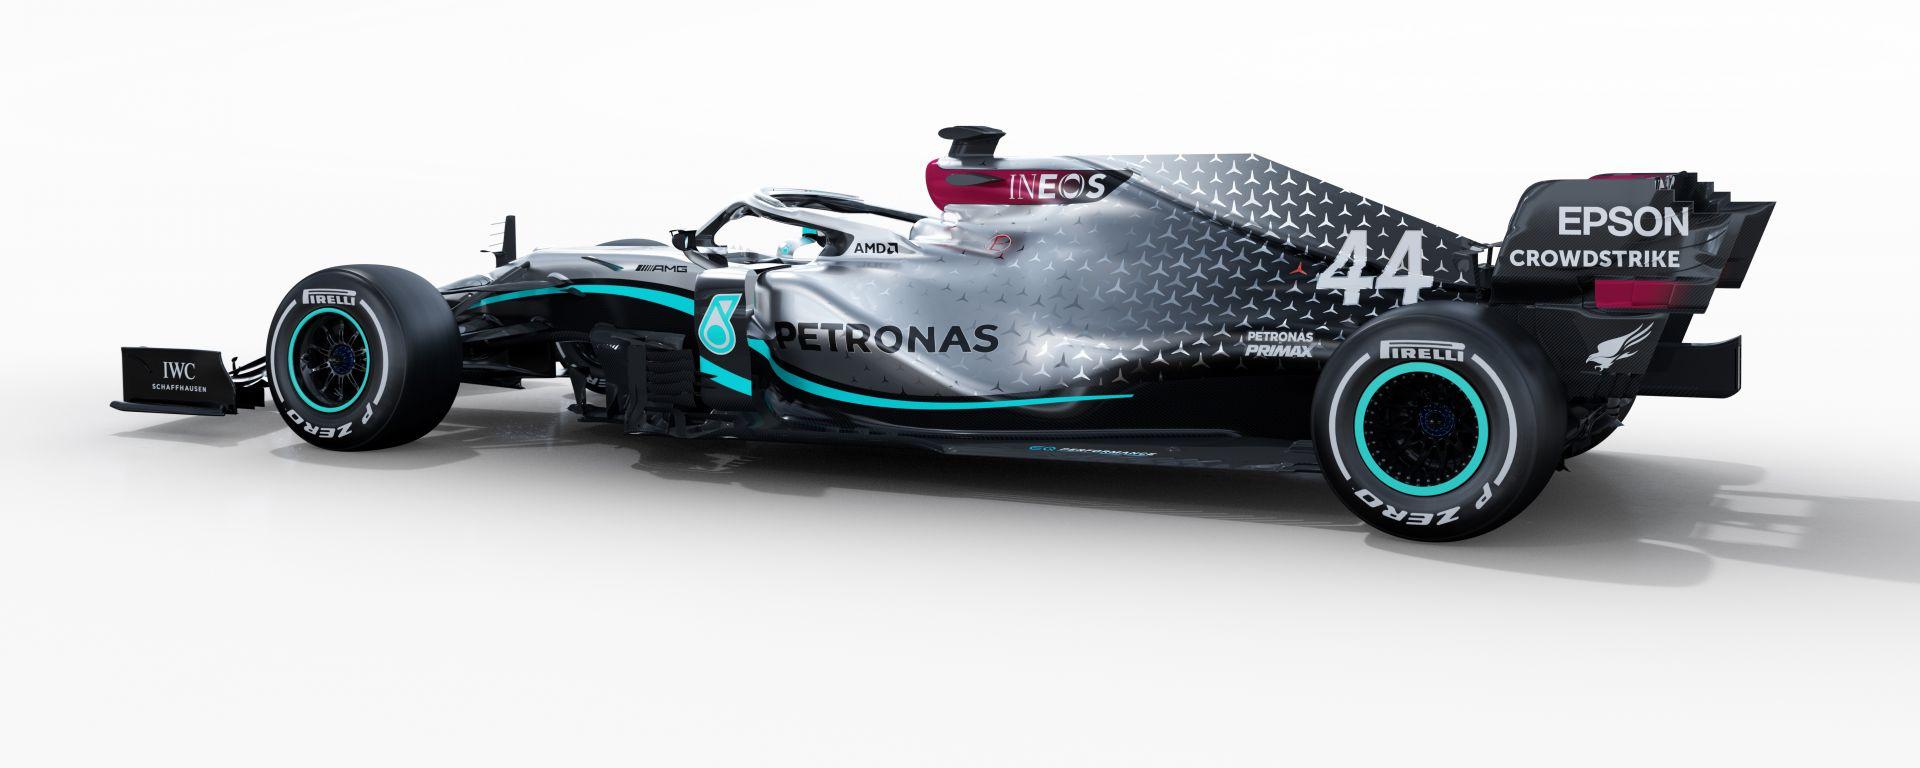 Mercedes F1 W11 EQ